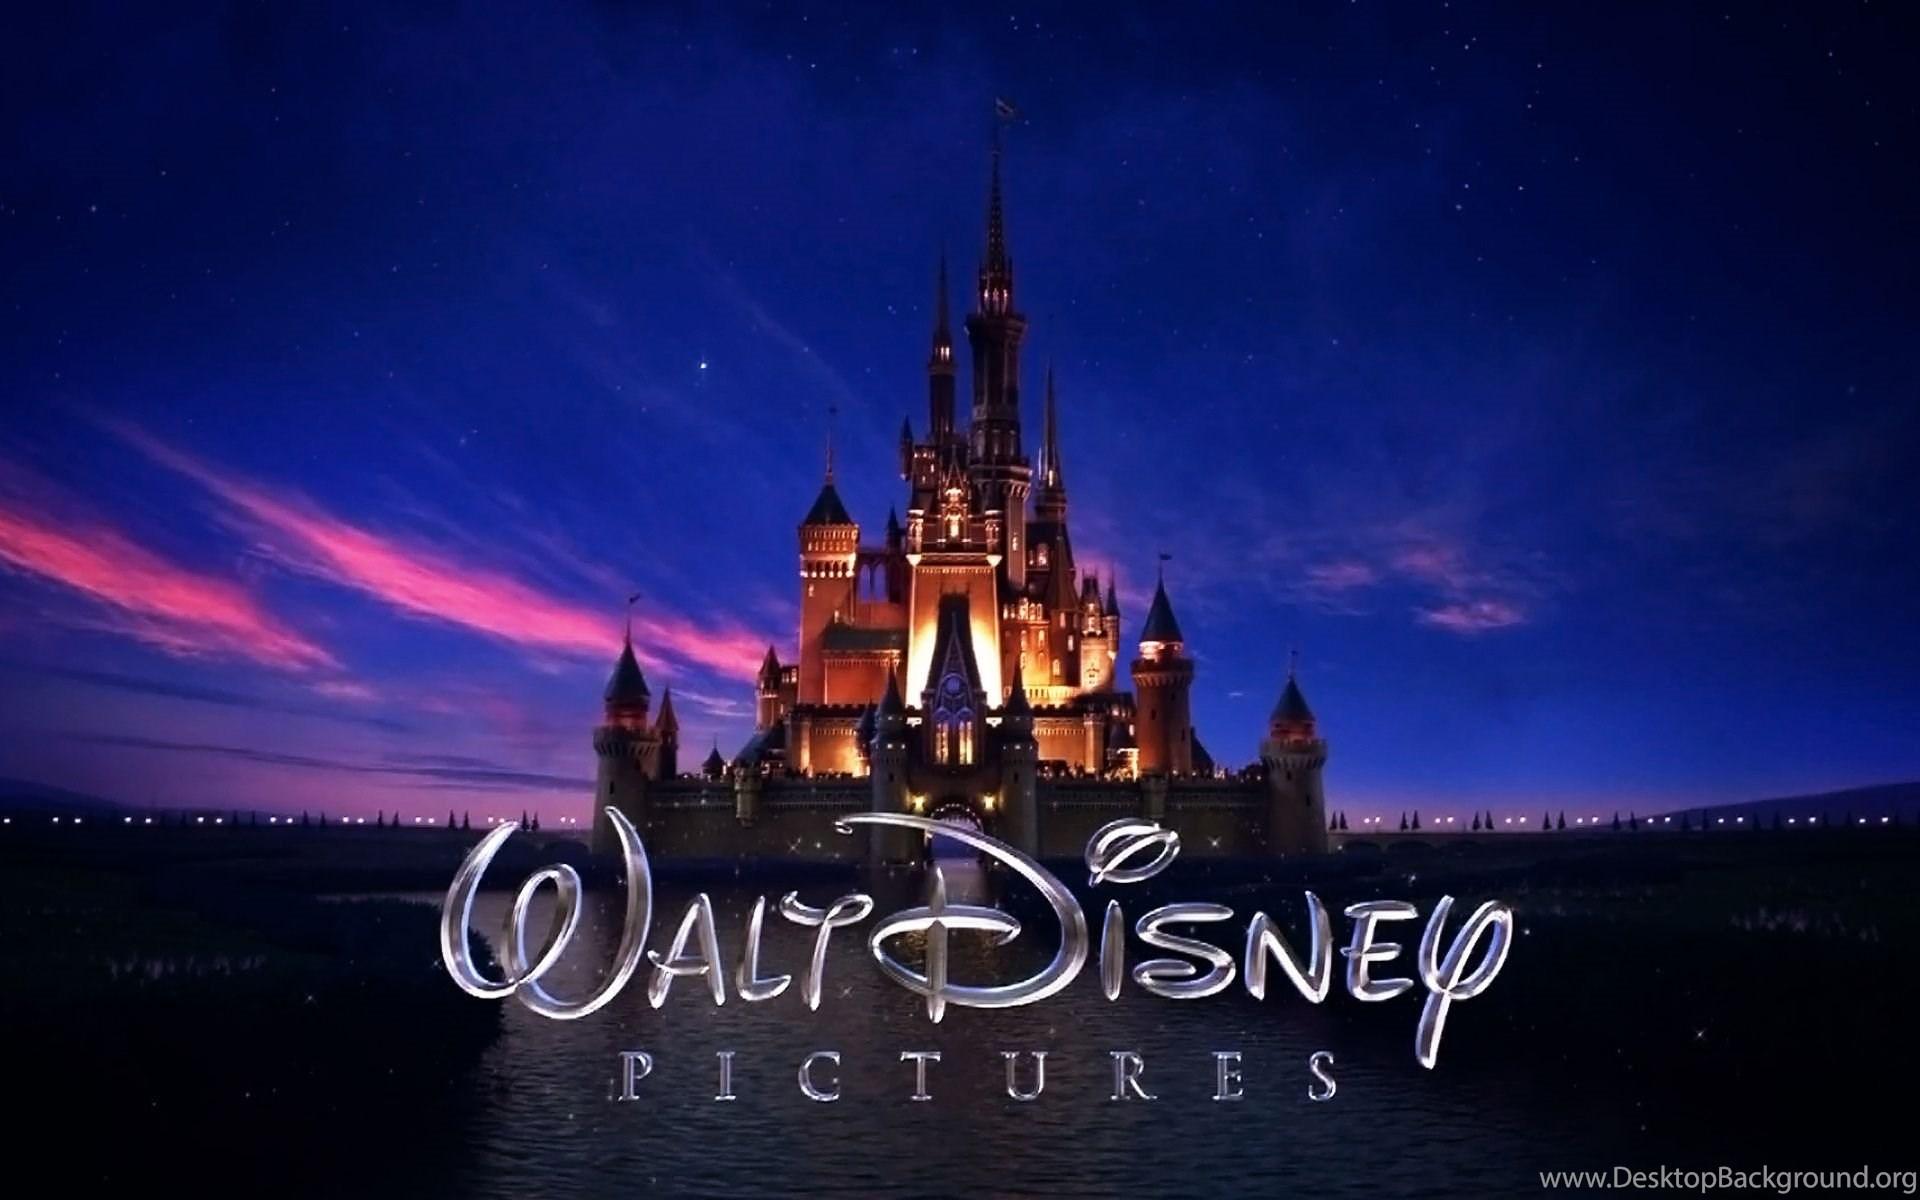 Donald Duck Disney Hd Wide Wallpaper For Widescreen 91 Wallpapers